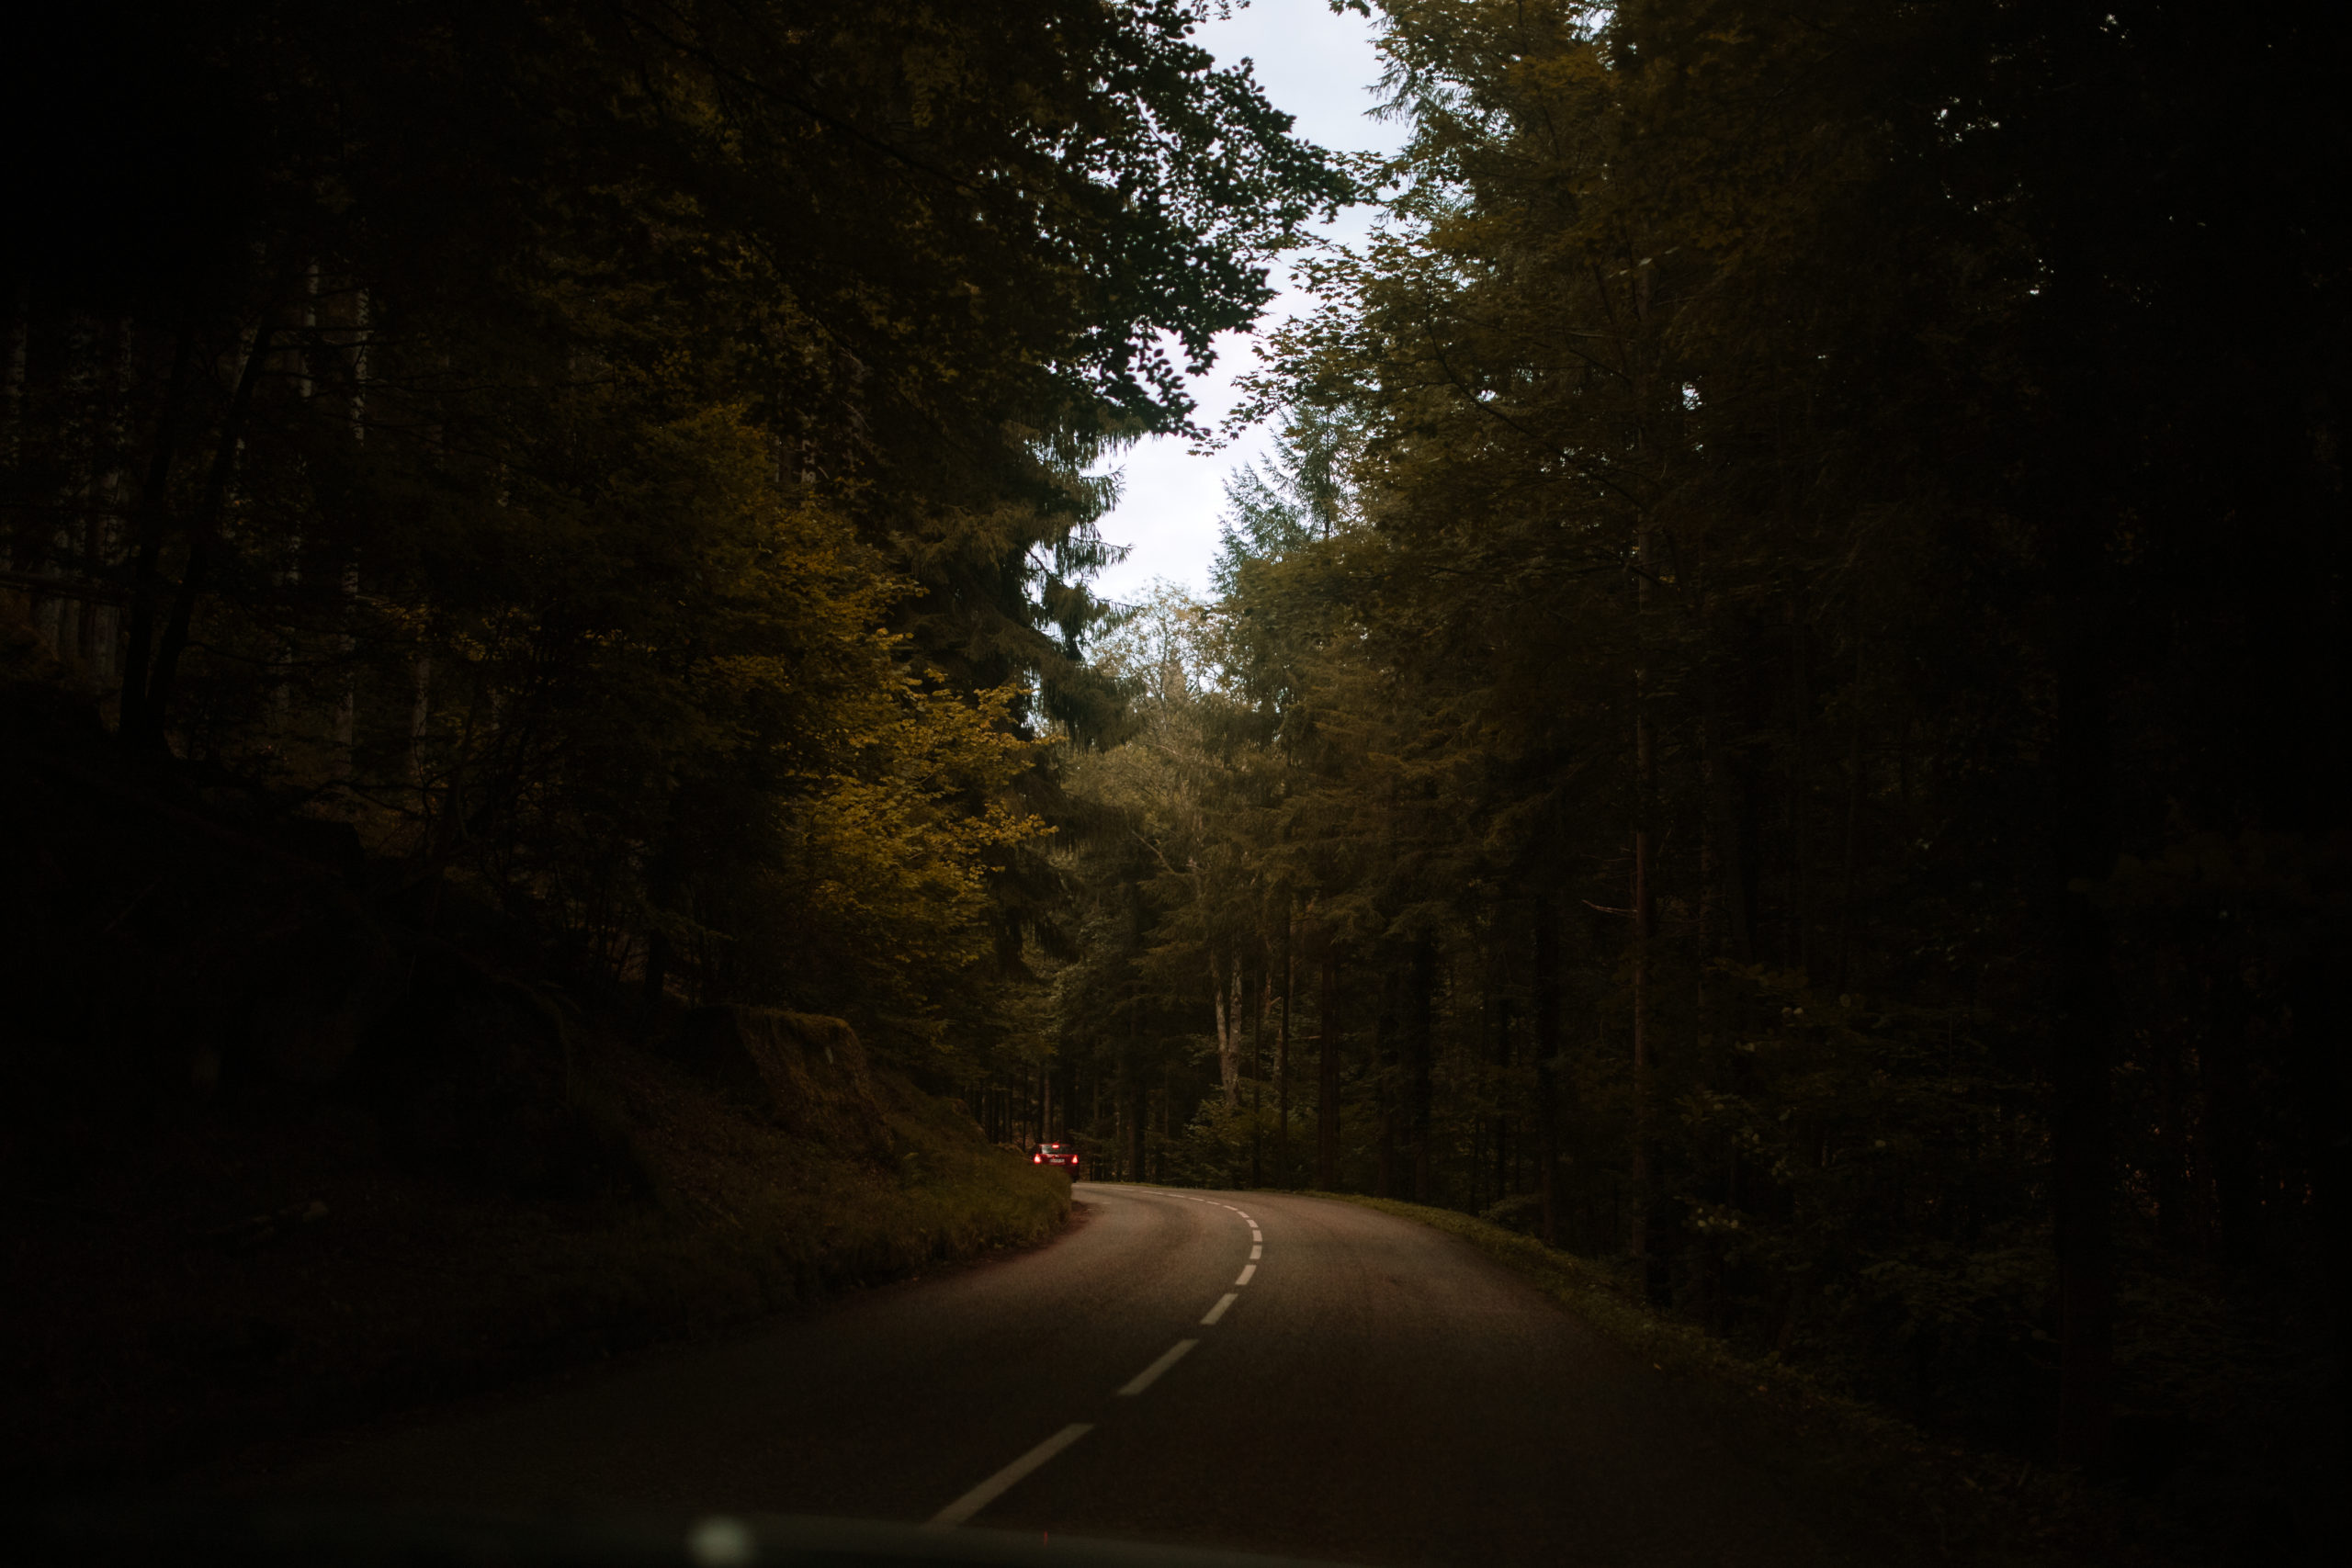 Brin d'humeur #1 — L'automne